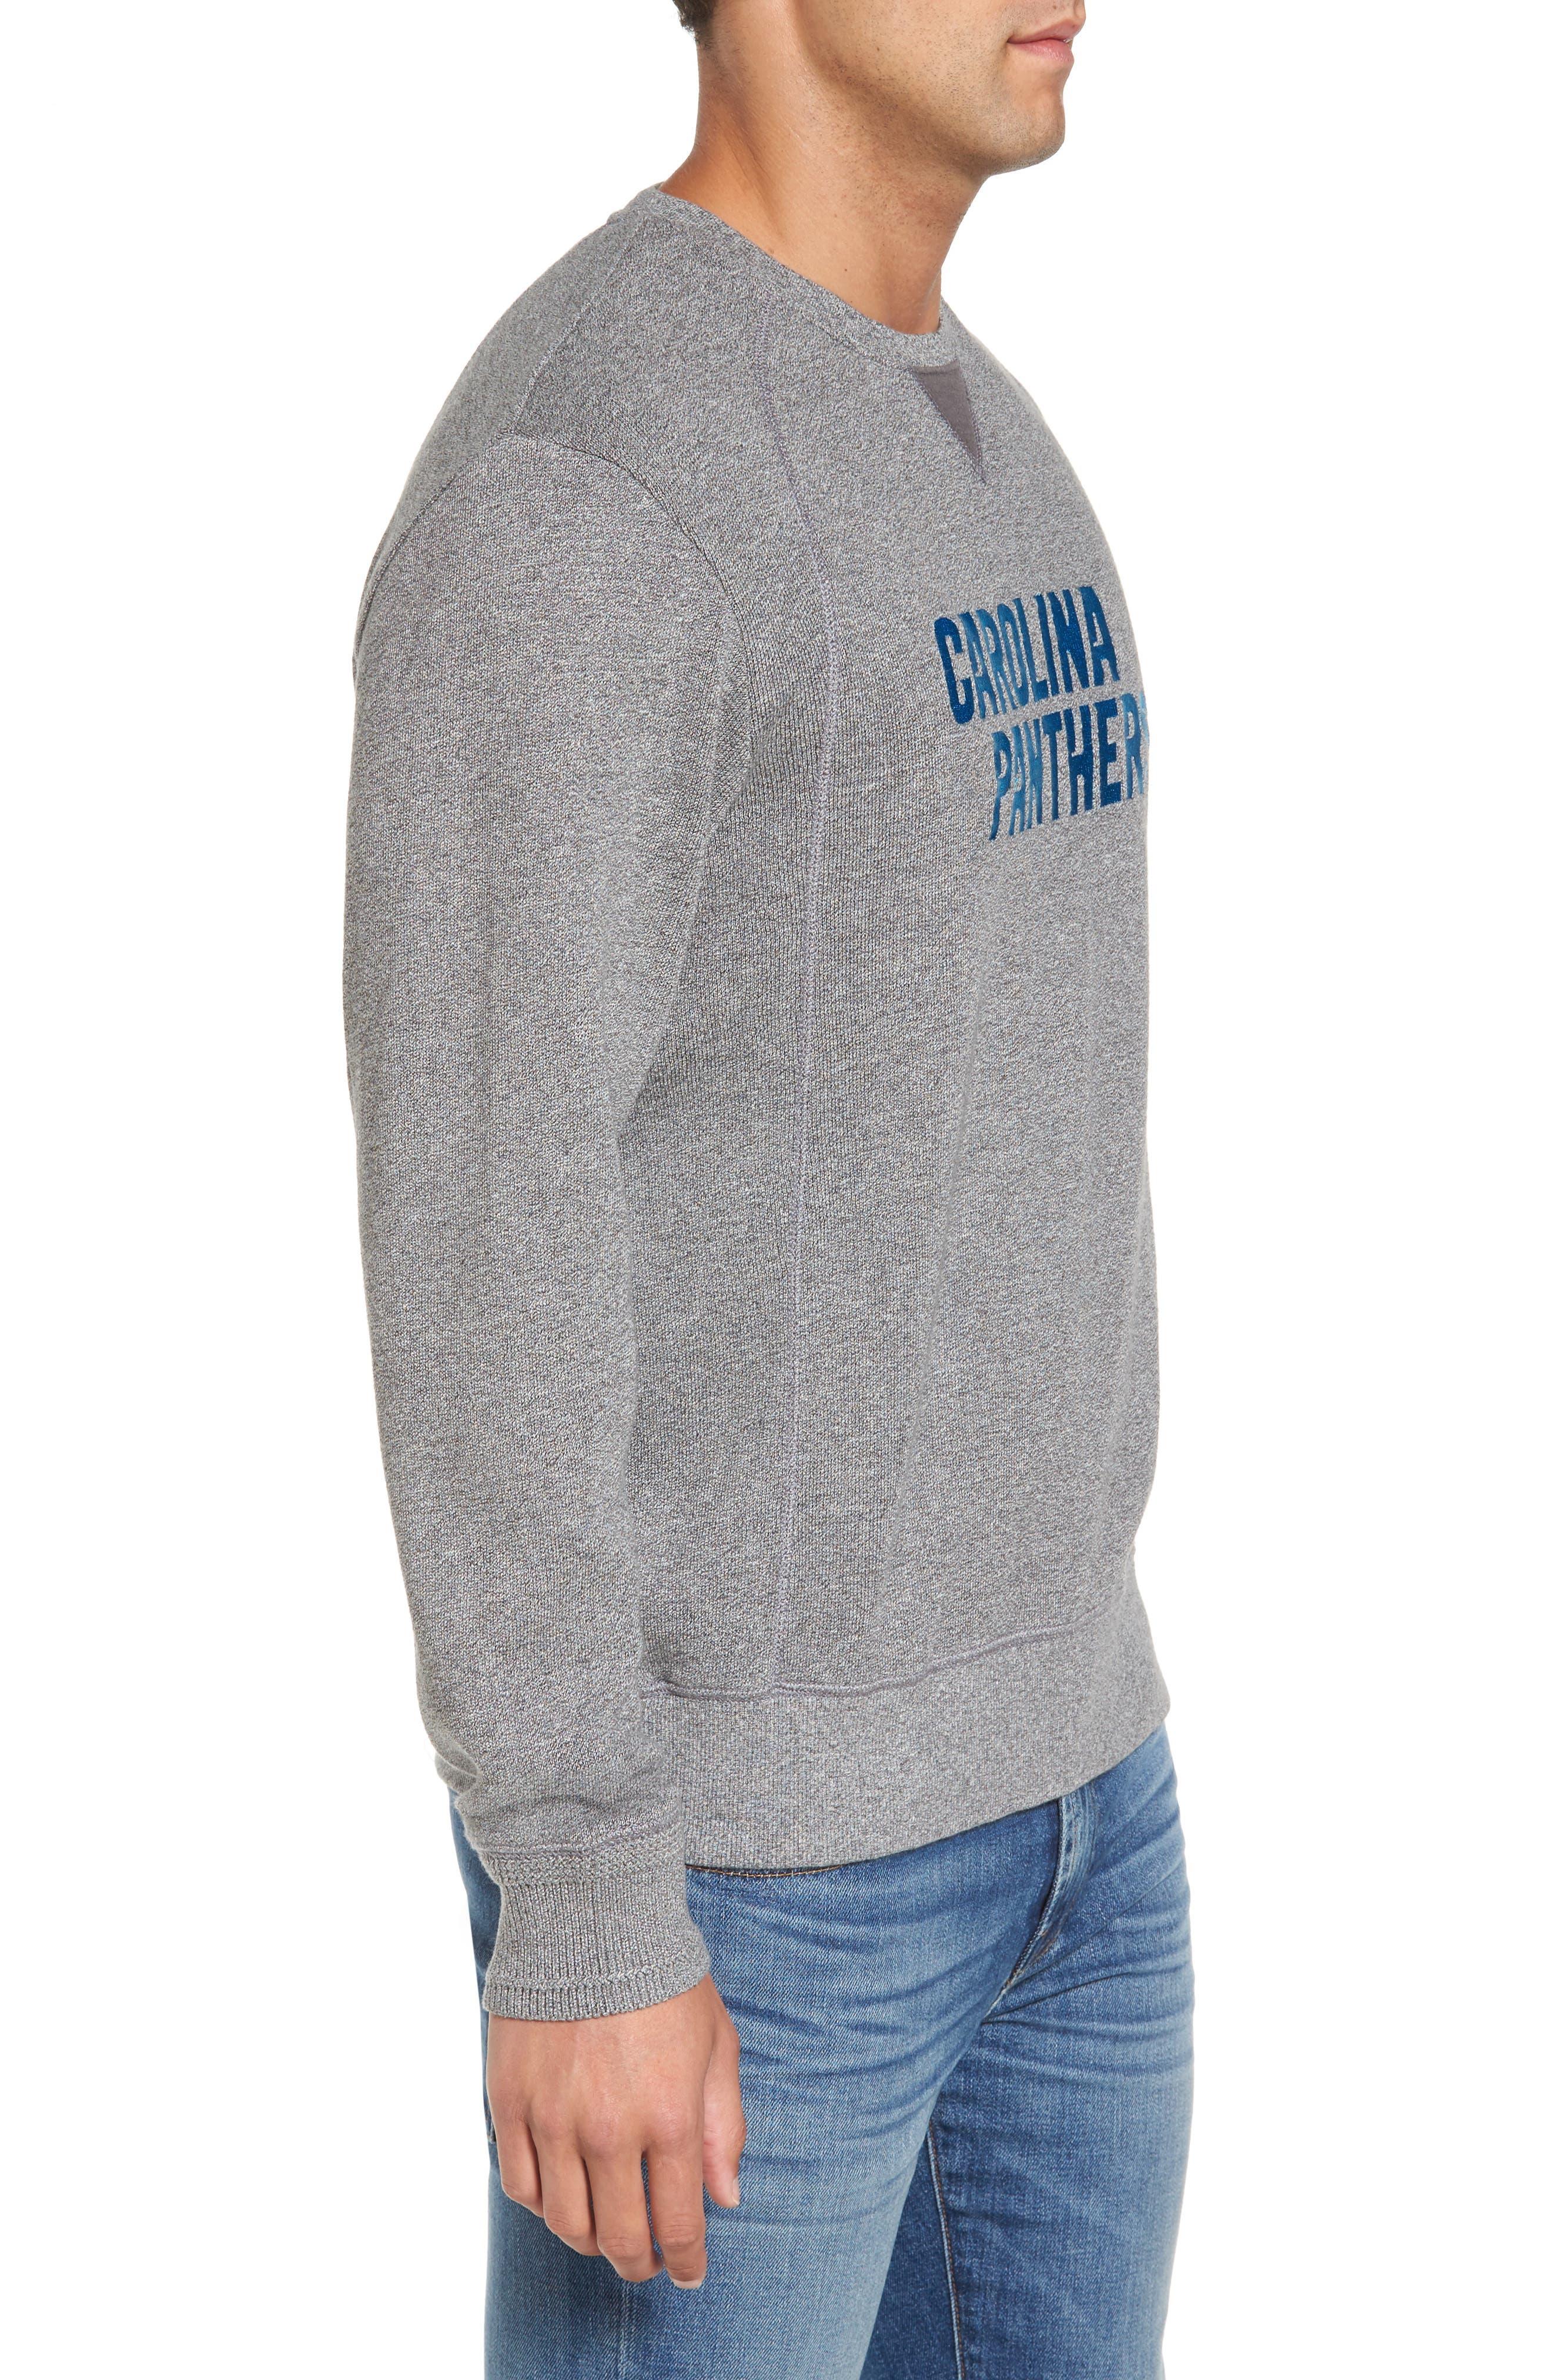 NFL Stitch of Liberty Embroidered Crewneck Sweatshirt,                             Alternate thumbnail 83, color,